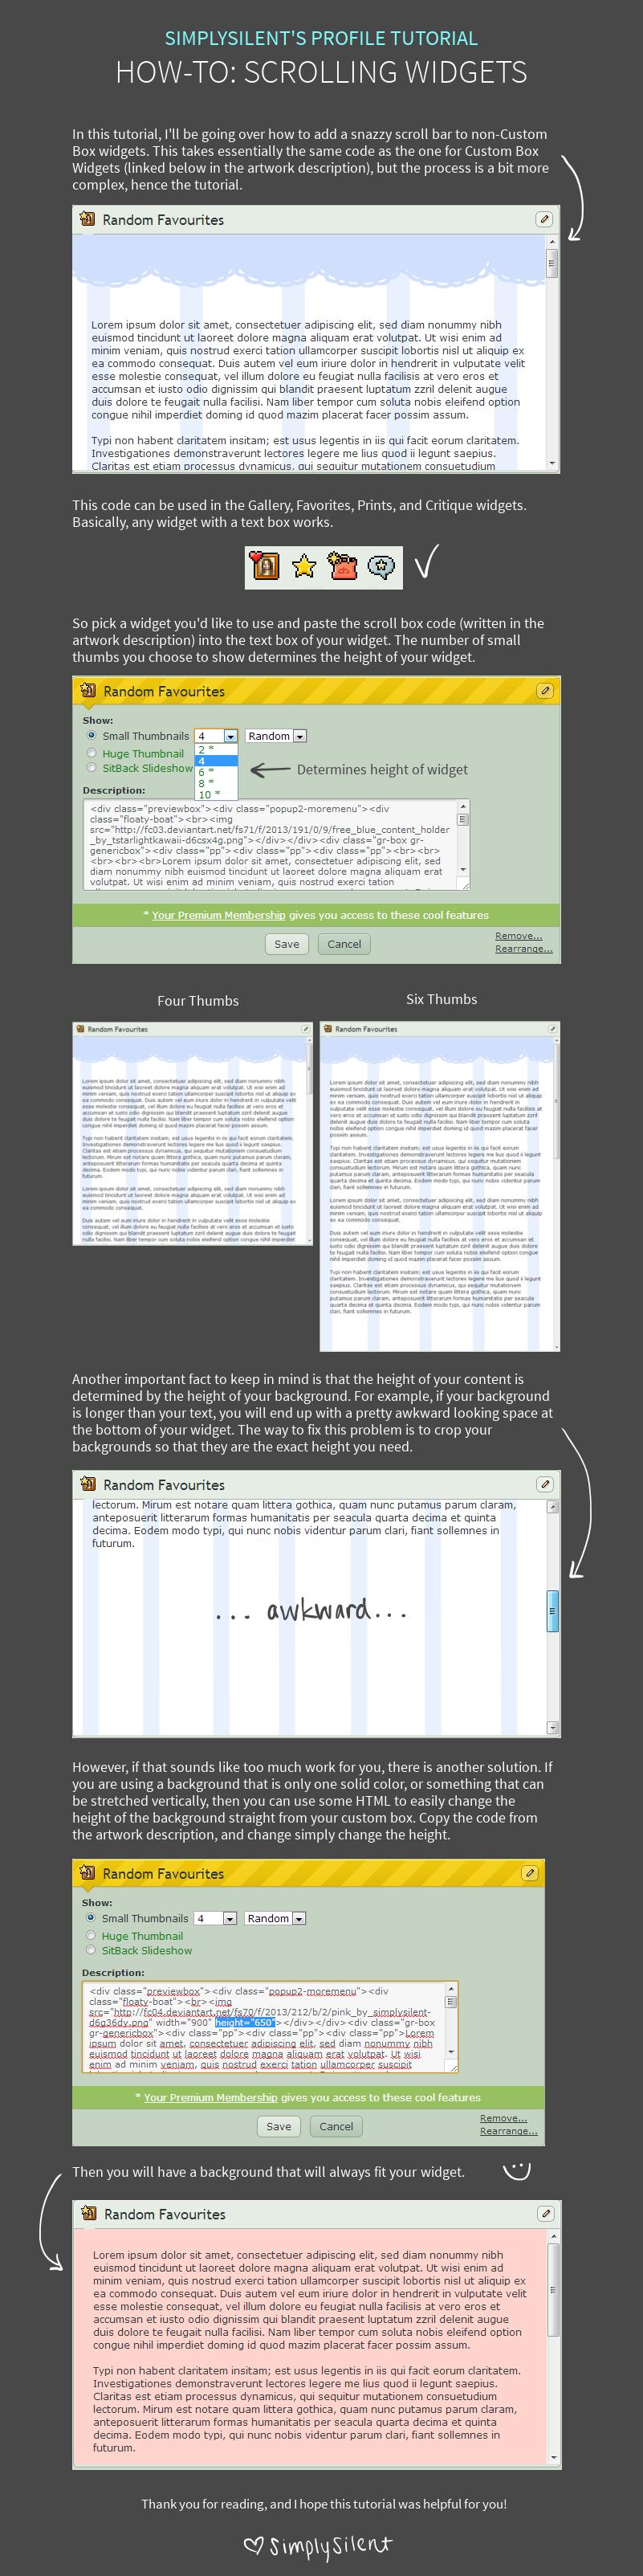 Scrolling Widgets (non-Custom Box) by SimplySilent